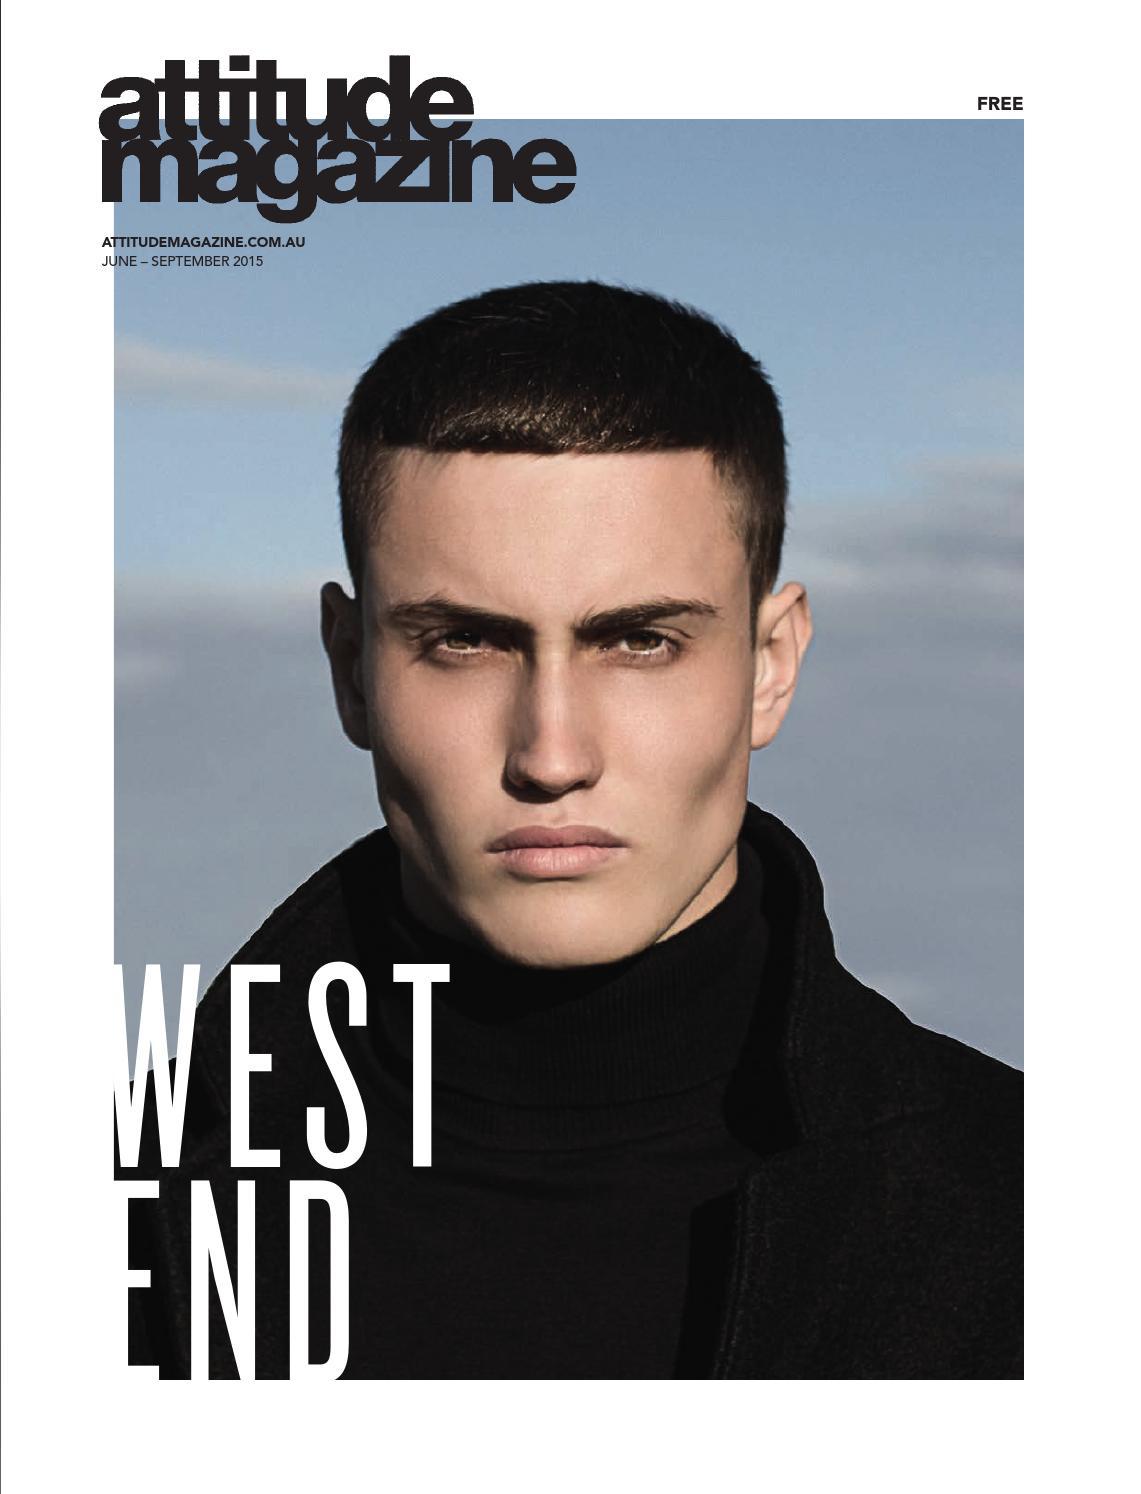 Attitude Fashion Magazine - Spring Edition by Rip It Up Publishing - issuu